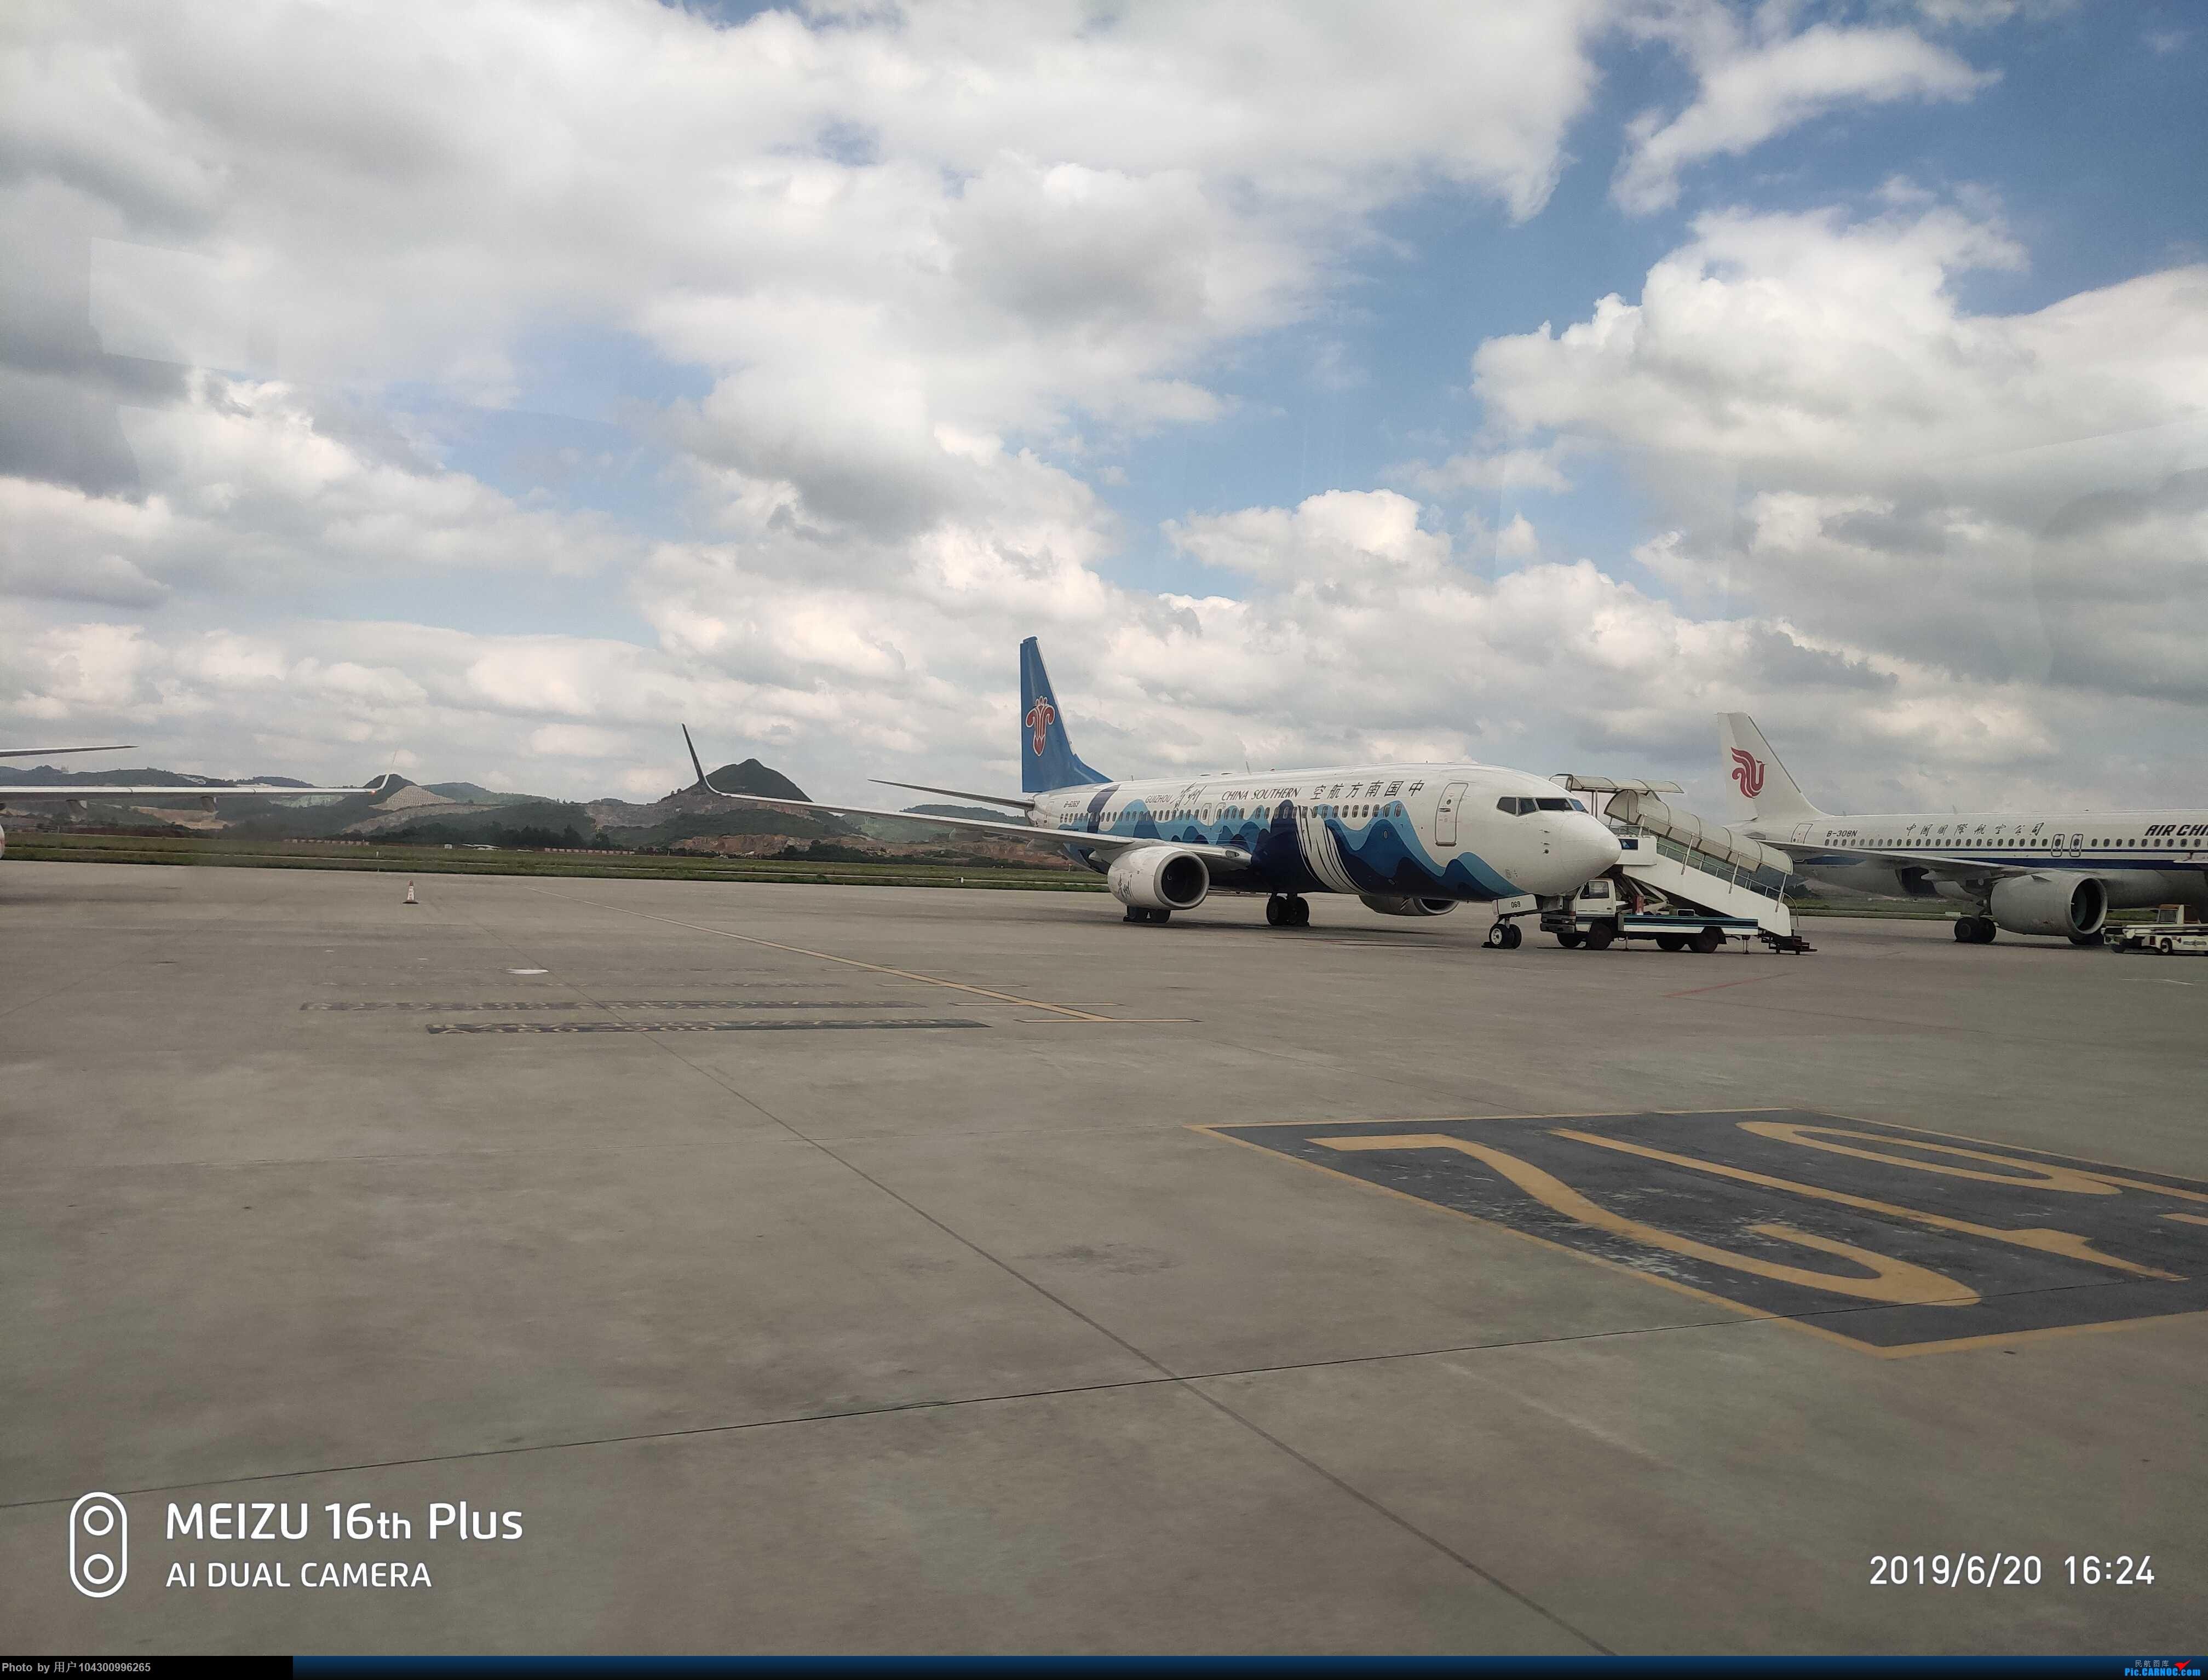 Re:[原创]DM哥飞行游记--贵阳往返荔波2日游 BOEING 737-800 B-6069 中国贵阳龙洞堡国际机场